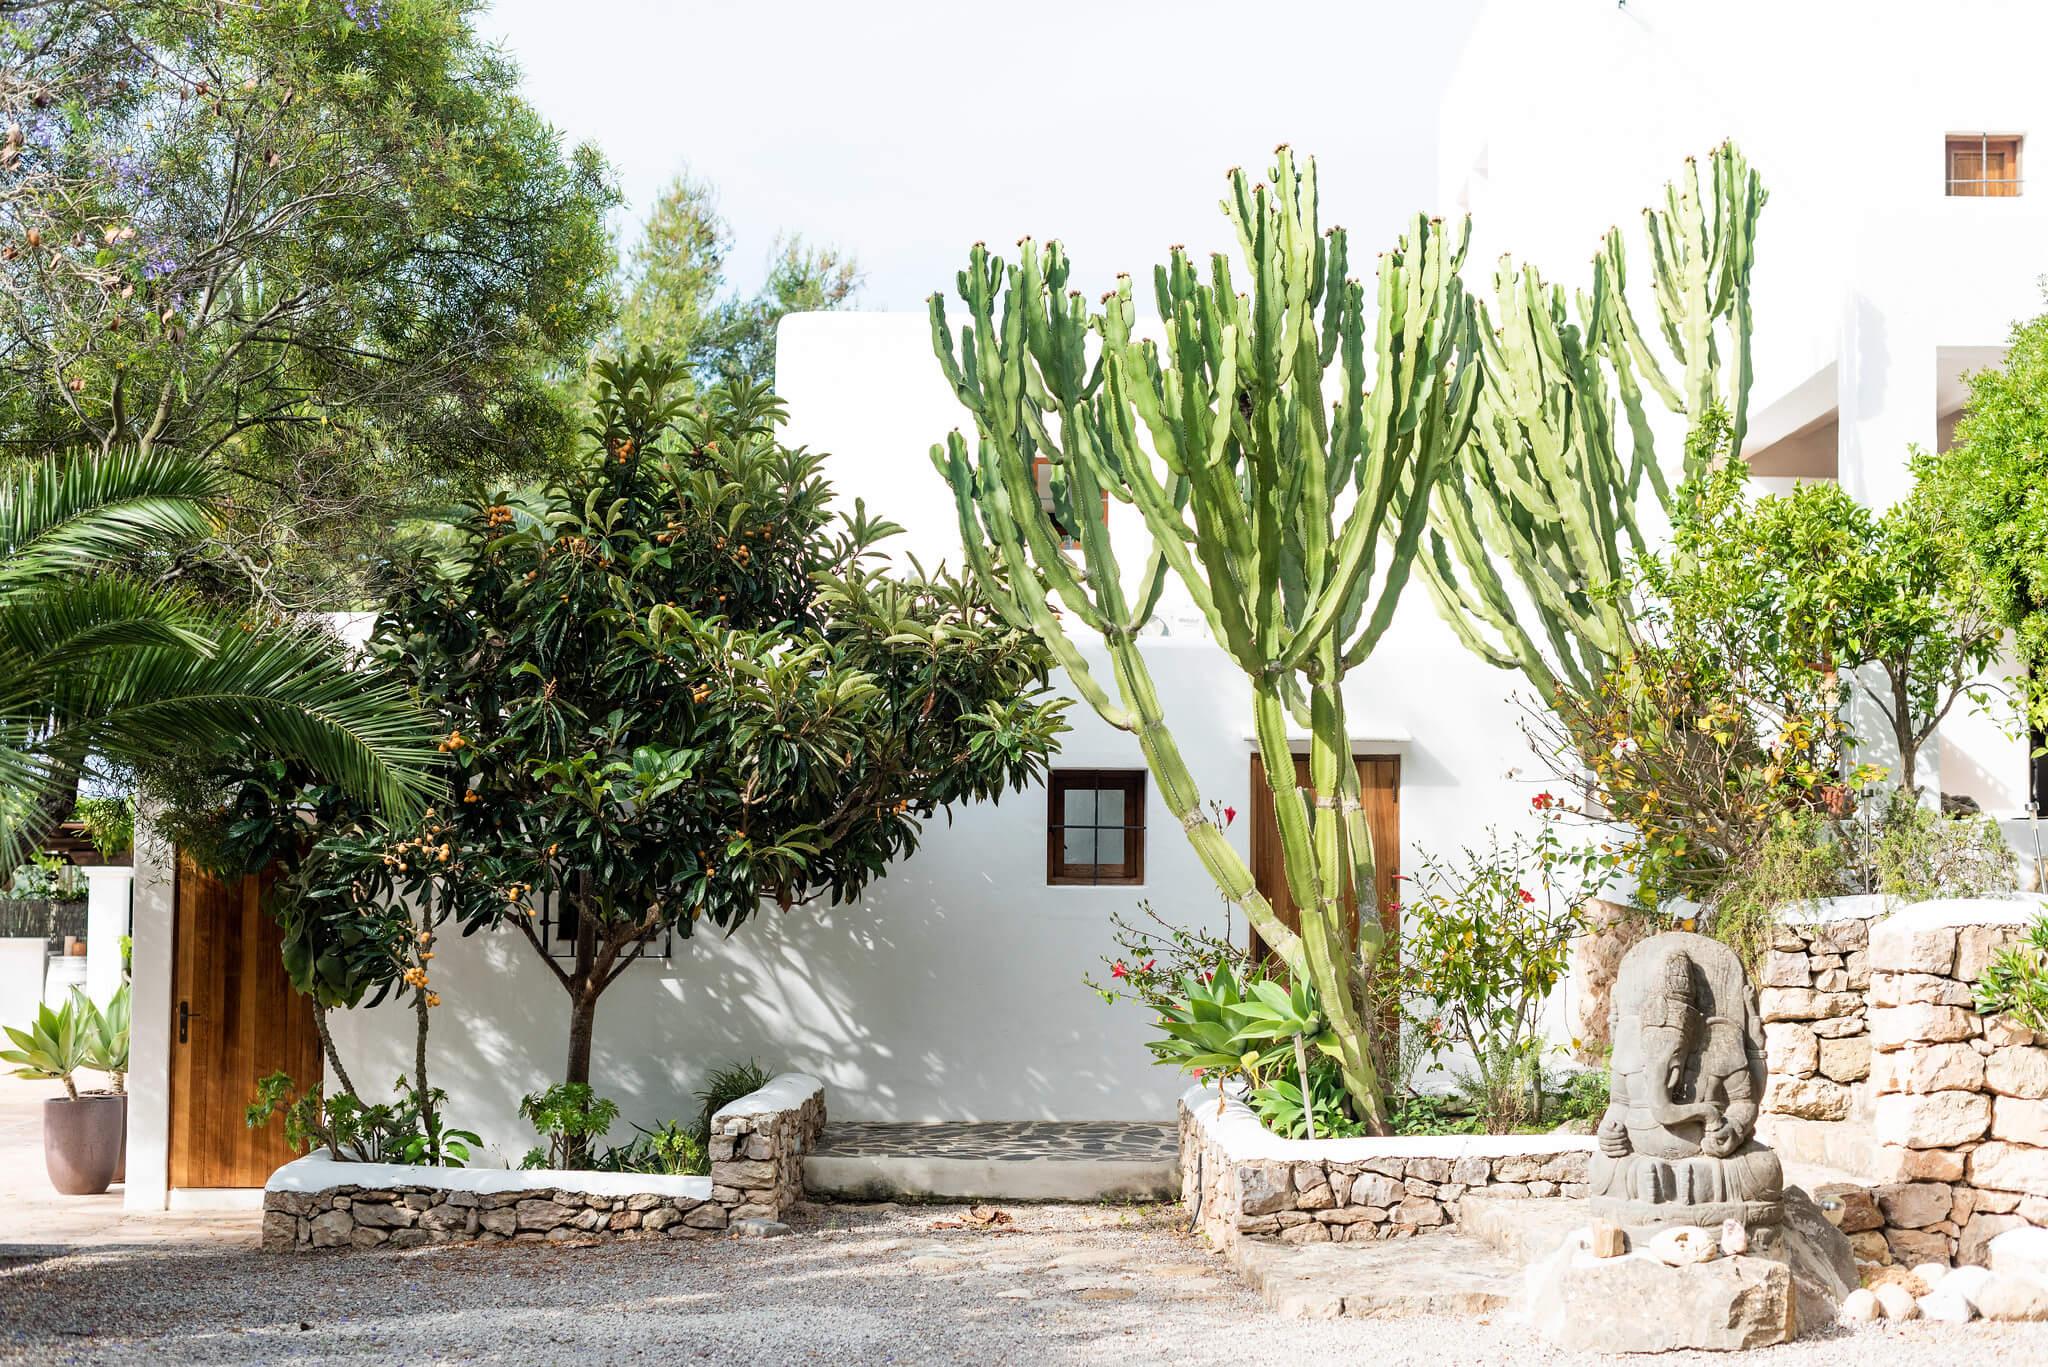 https://www.white-ibiza.com/wp-content/uploads/2020/05/white-ibiza-villas-can-lyra-exterior-cactus.jpg